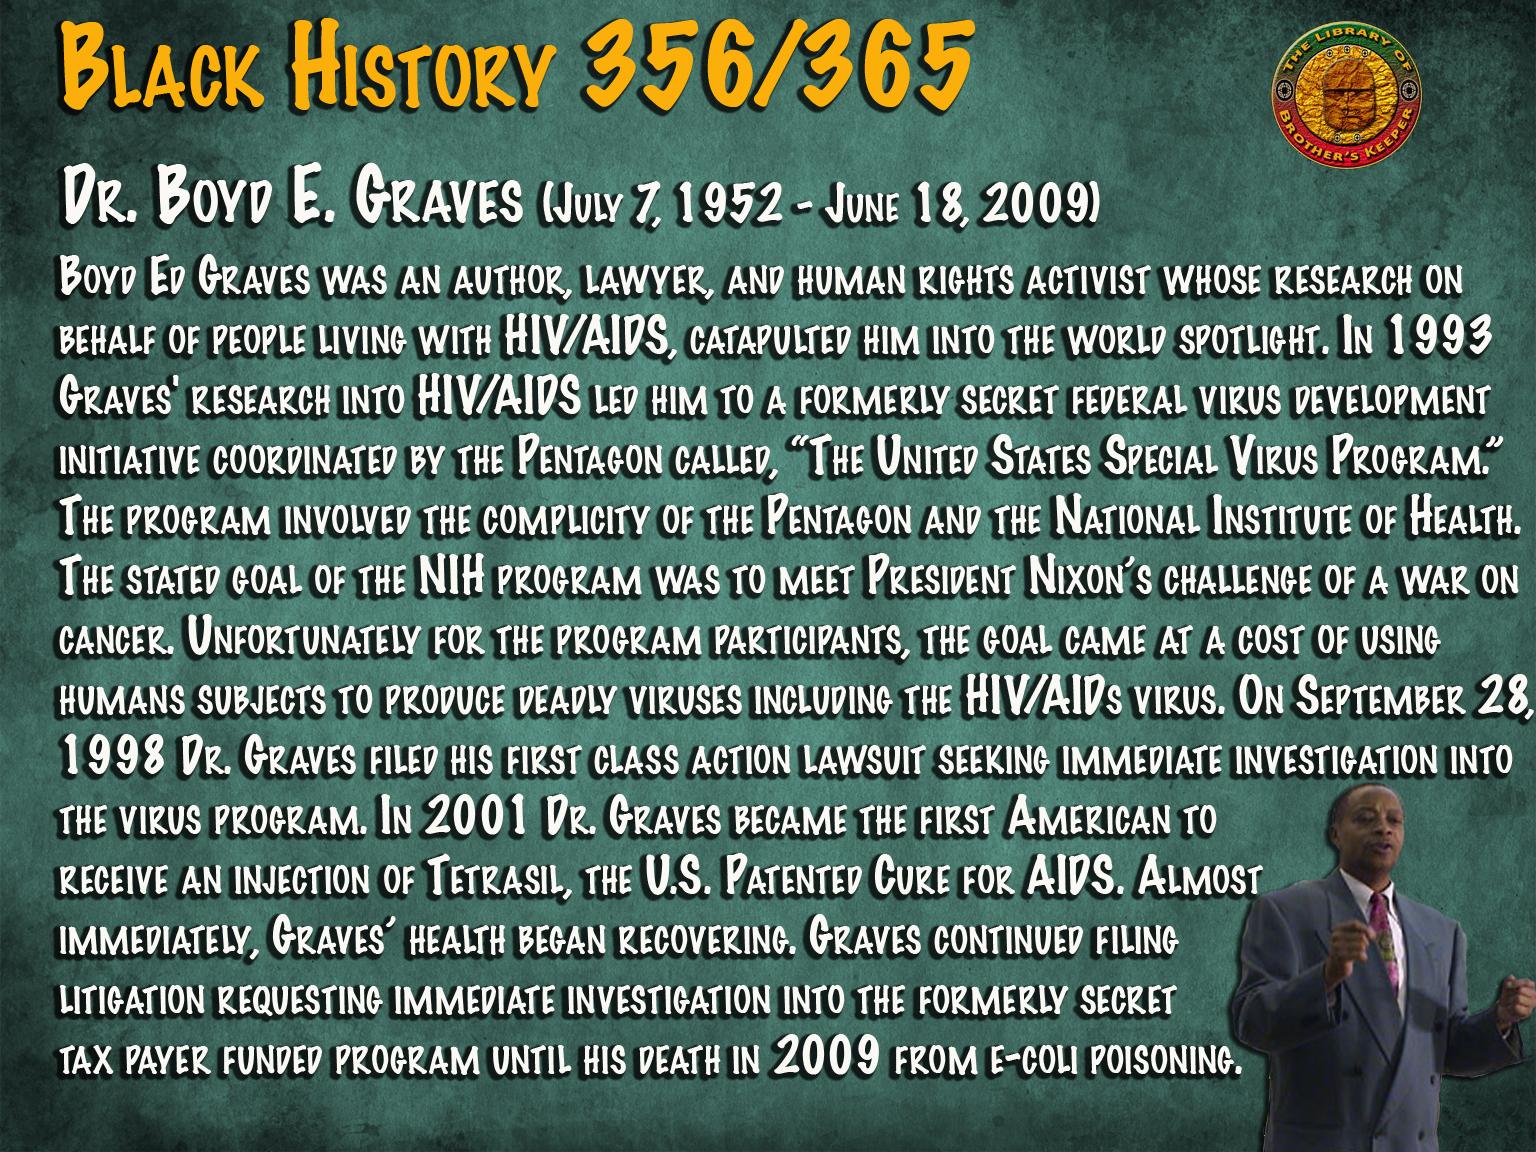 Dr. Boyd E. Graves